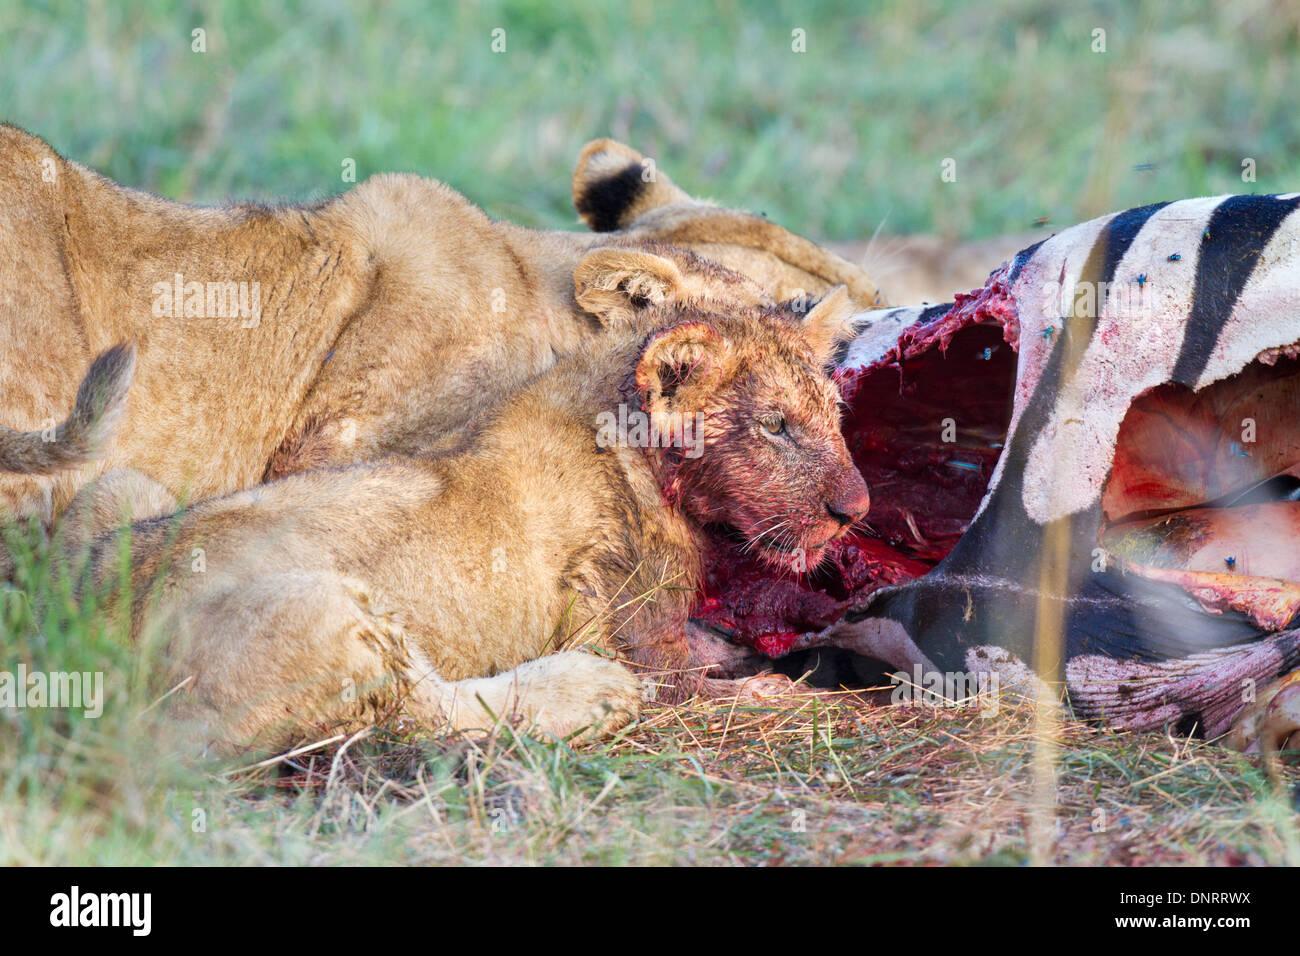 Lion cub eating zebra in Mara Reserve, Kenya - Stock Image